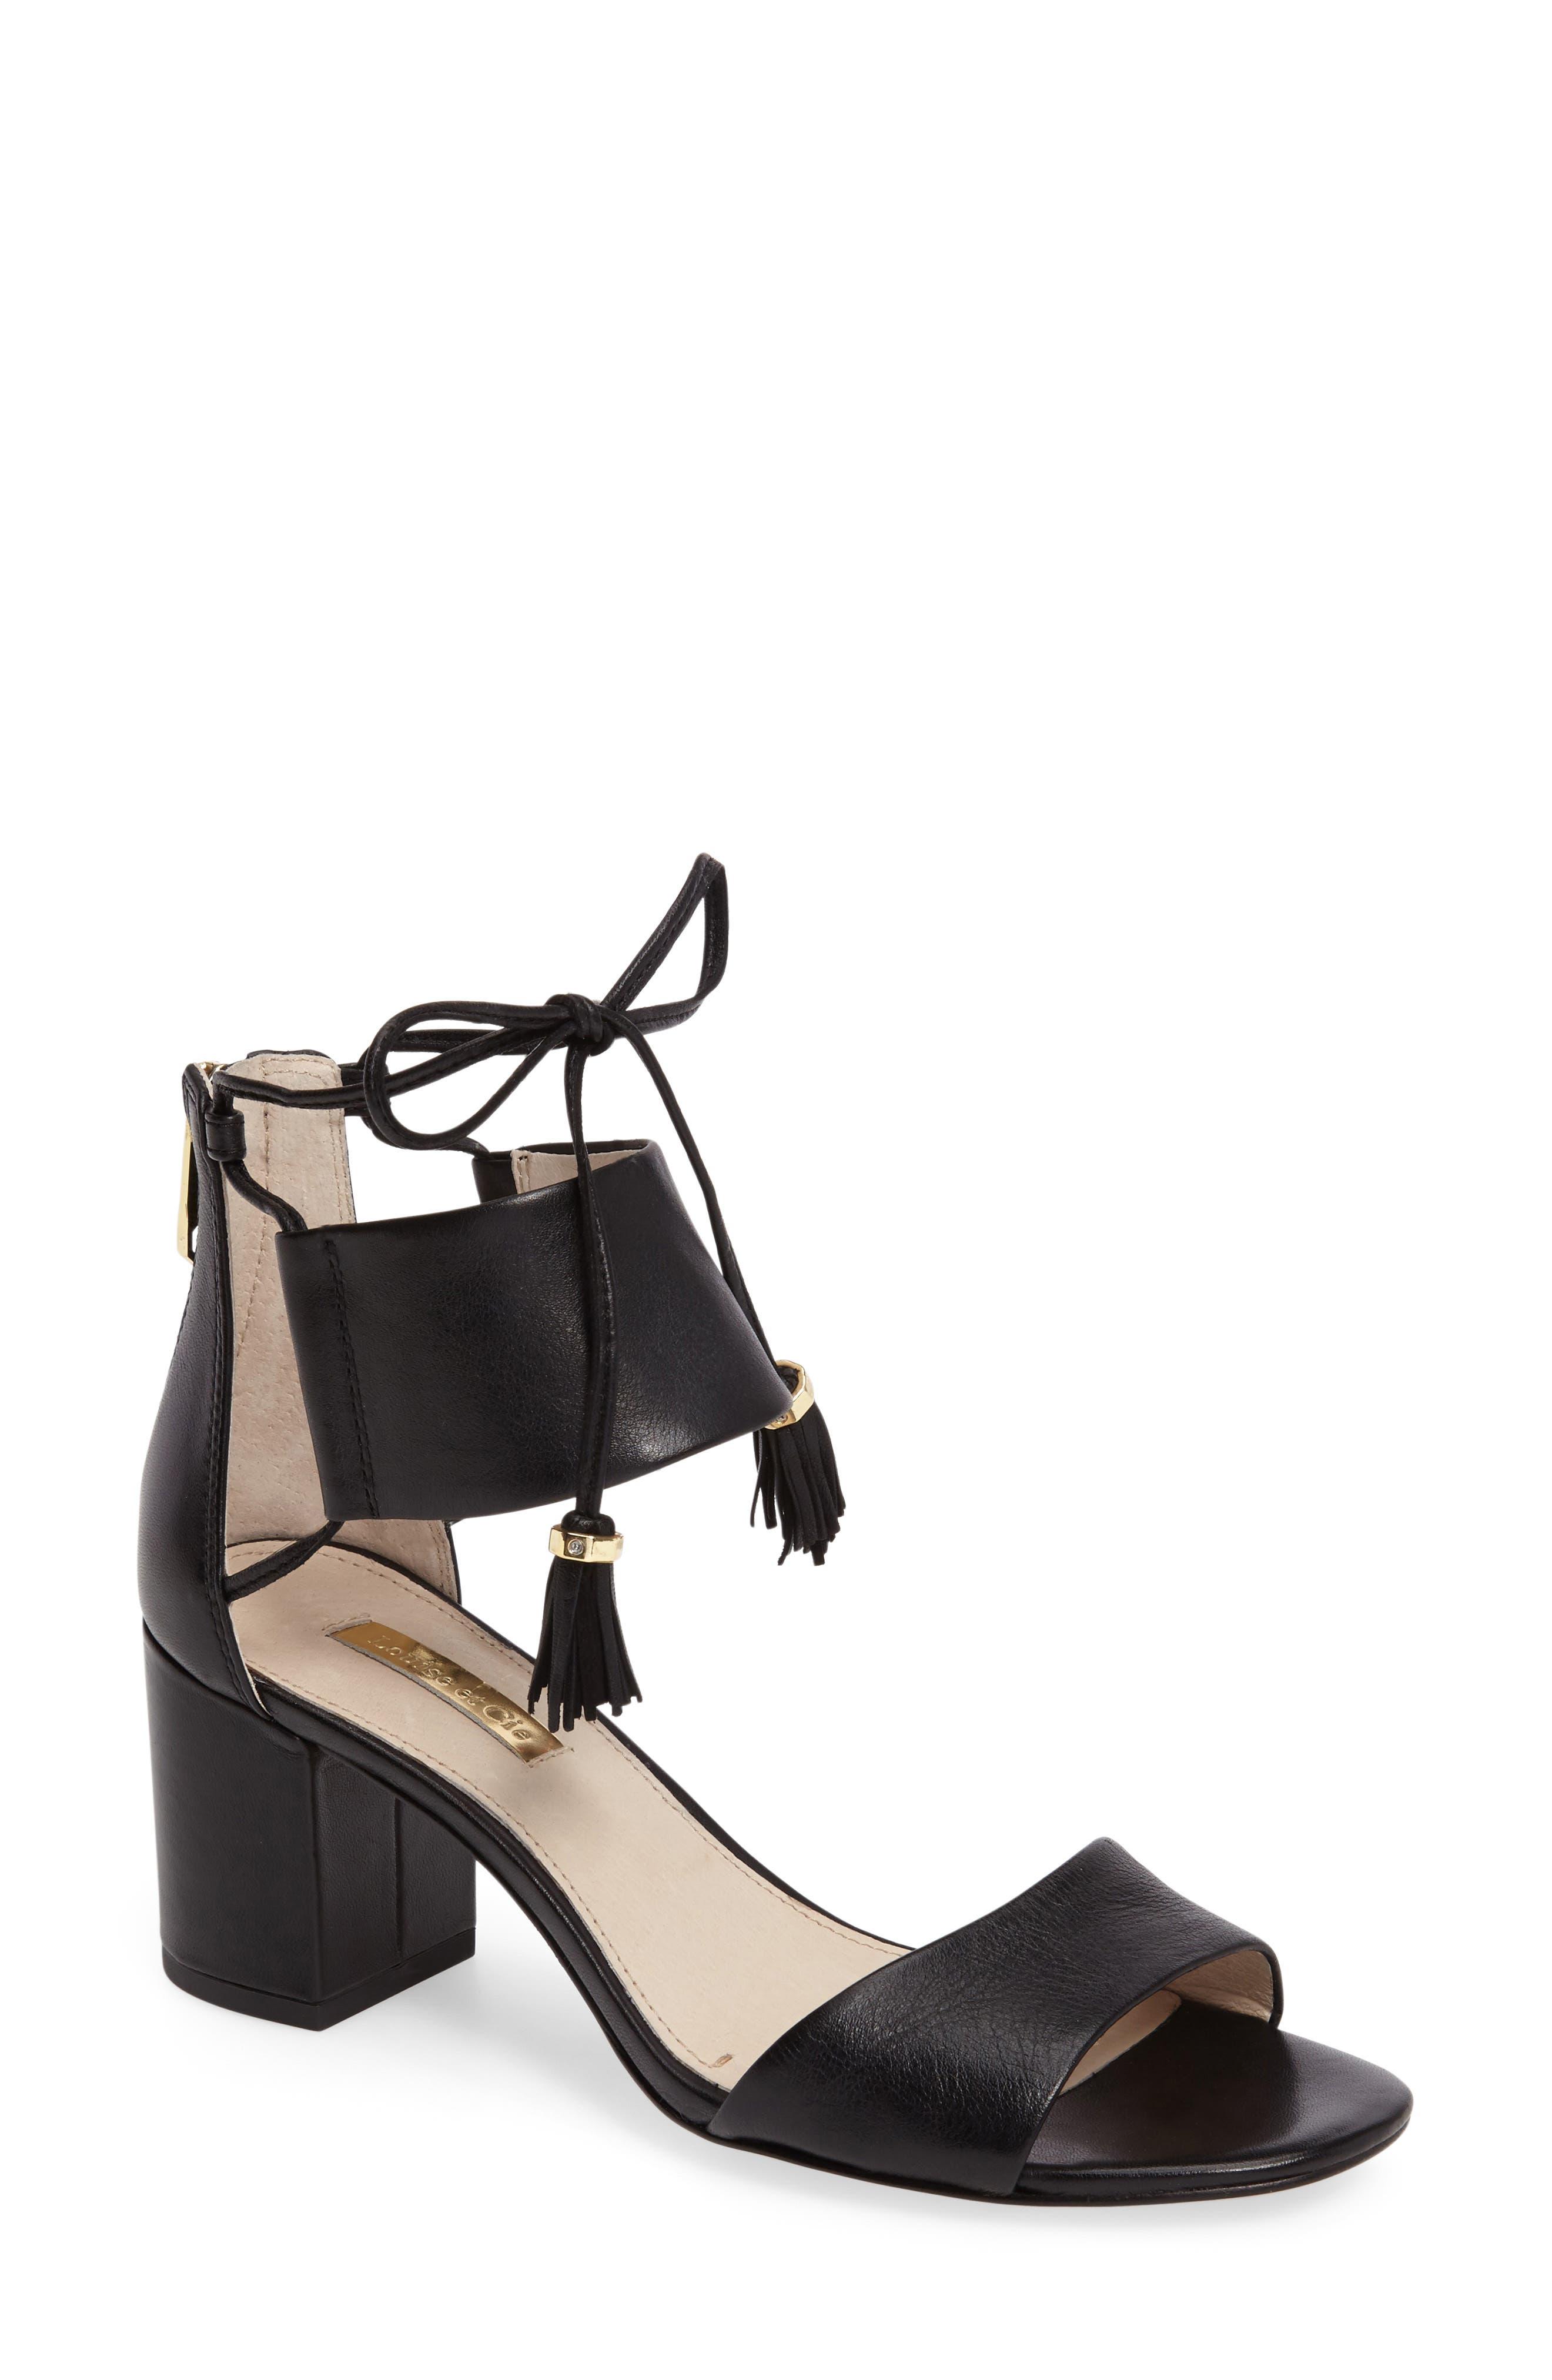 Main Image - Louise et Cie Keegan Block Heel Sandal (Women)